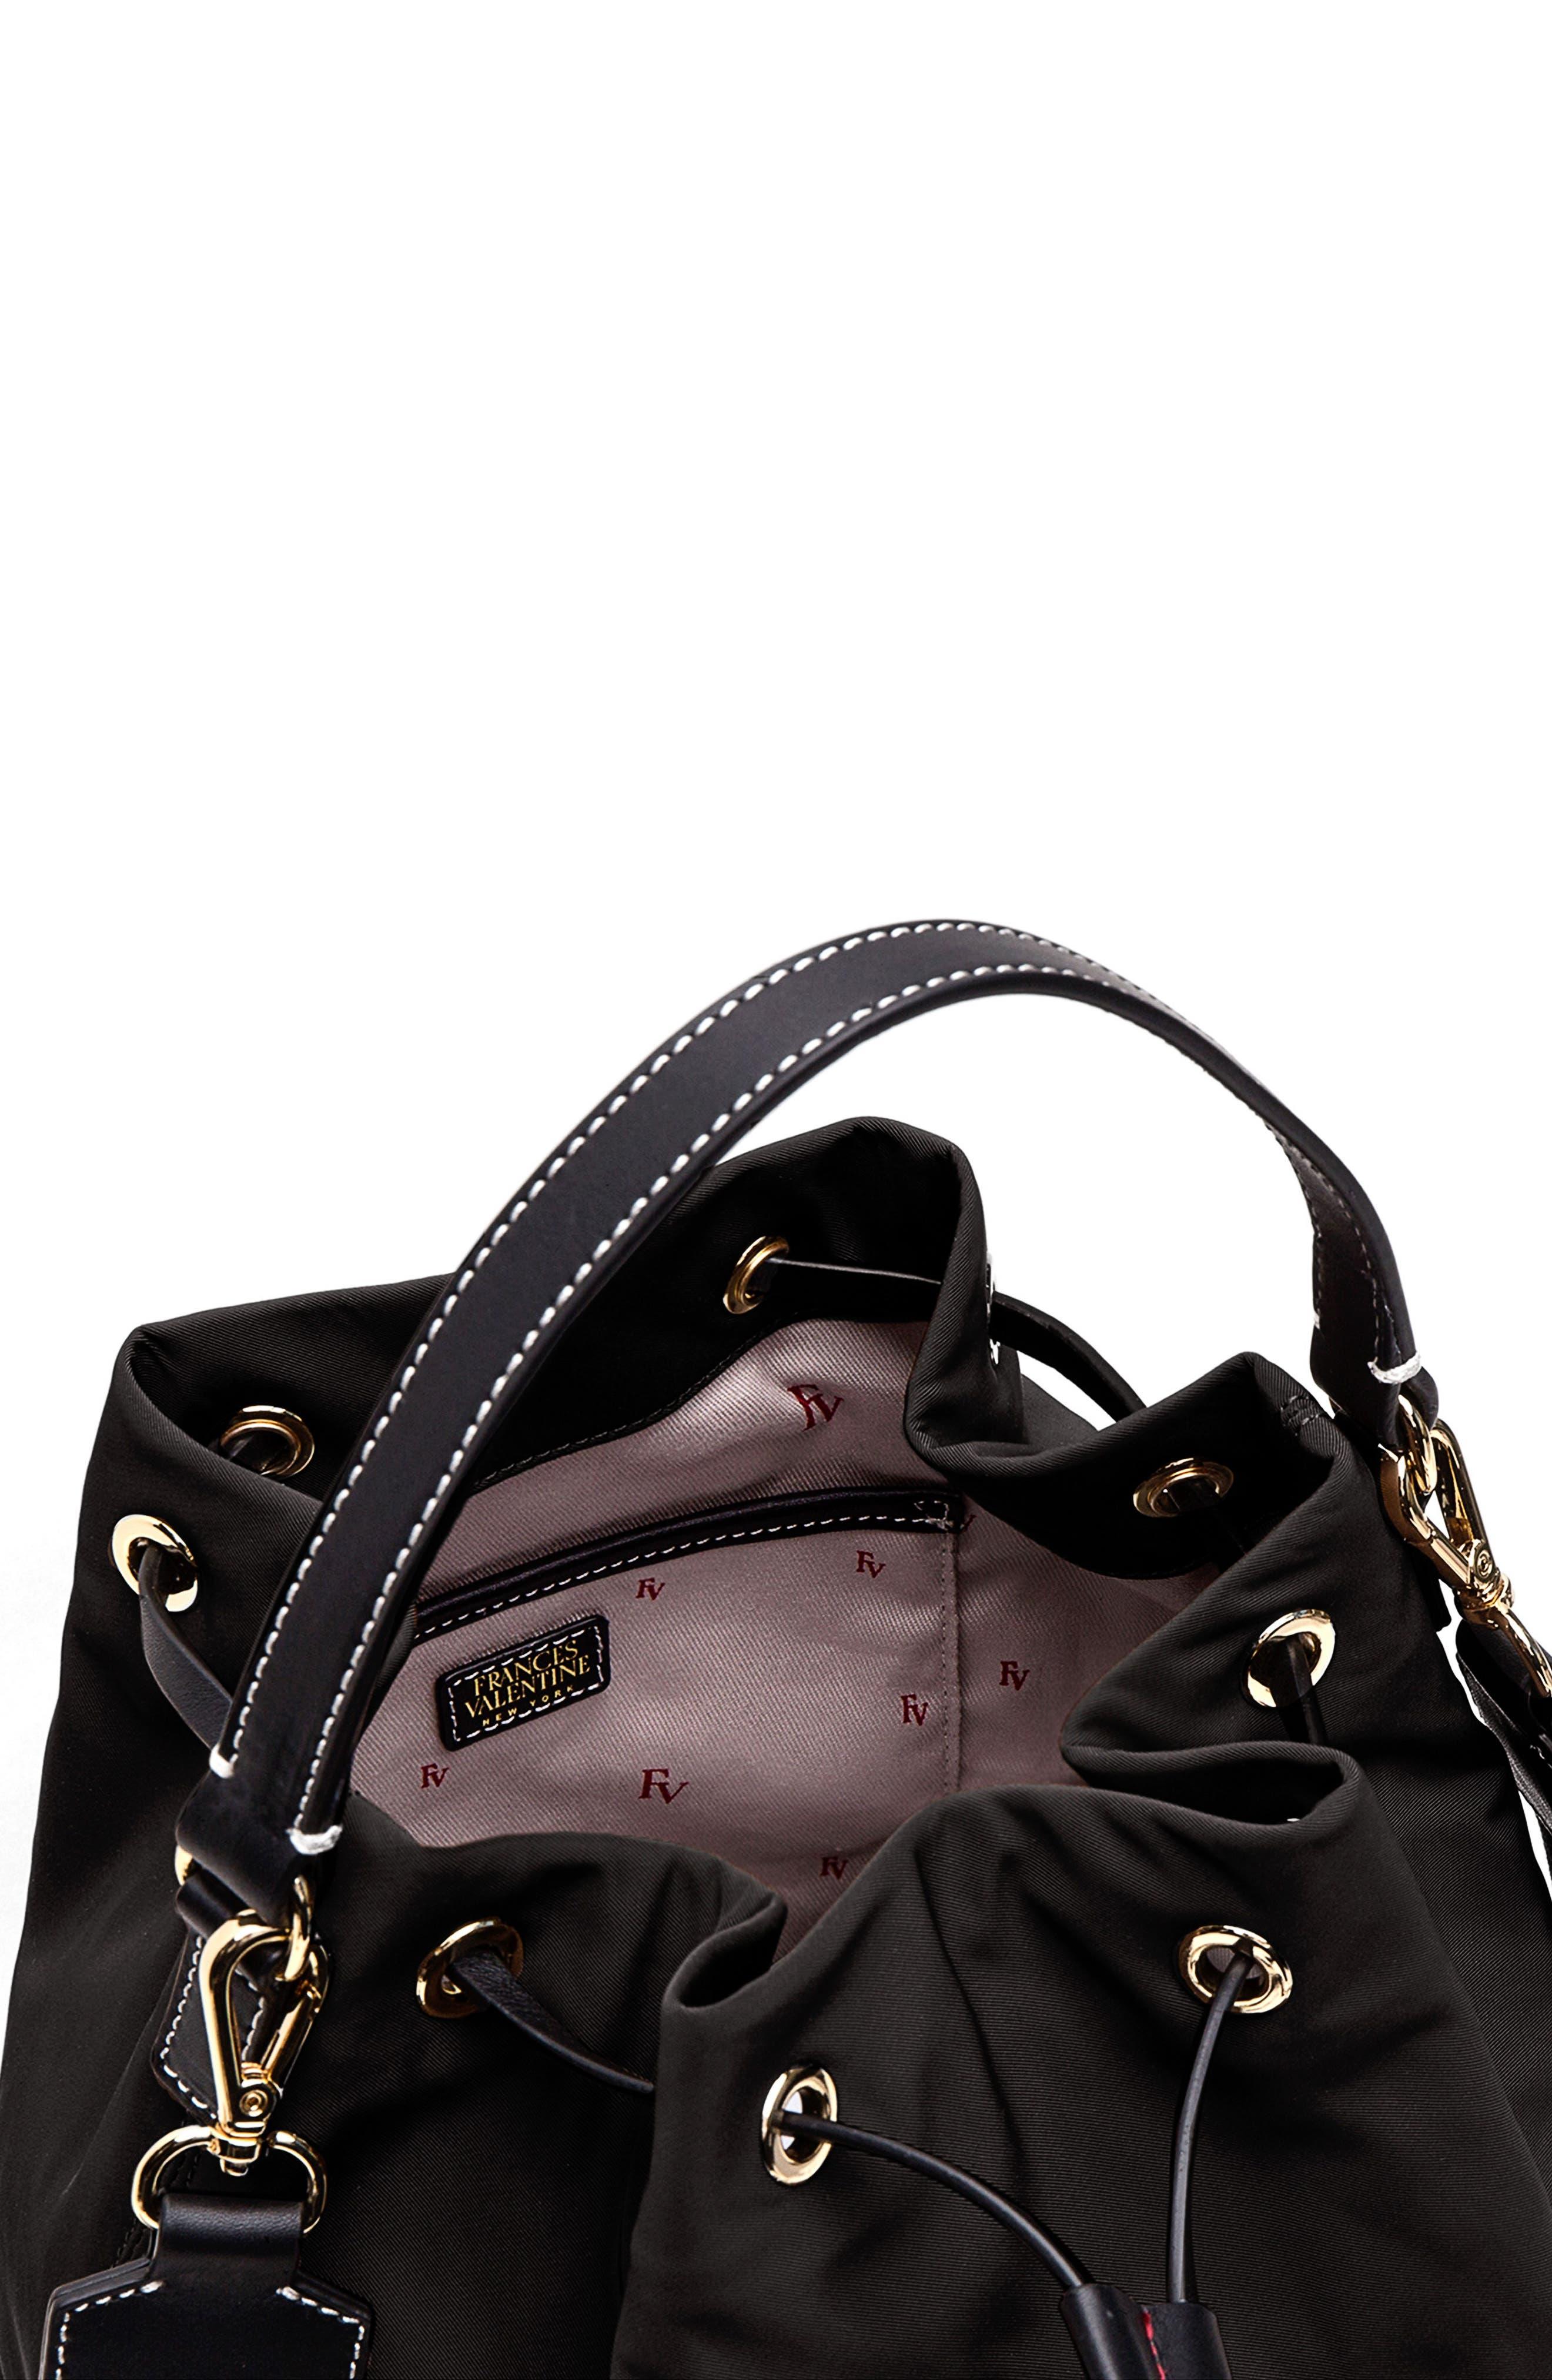 Medium Ann Nylon Bucket Bag,                             Alternate thumbnail 13, color,